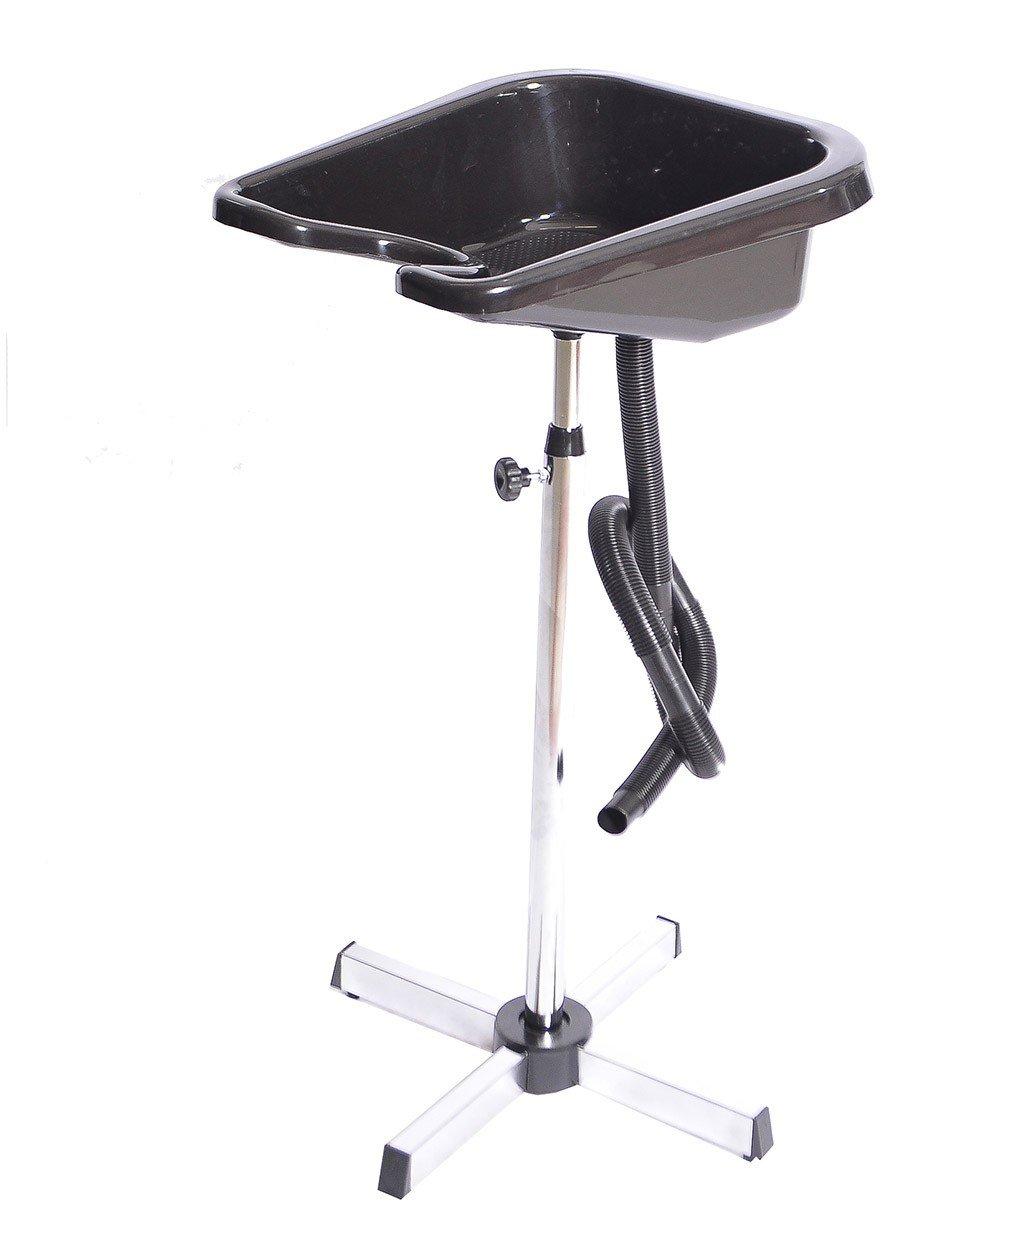 PIBBS Portable Head Washing Unit Black (Model: 210) by Pibbs Industries